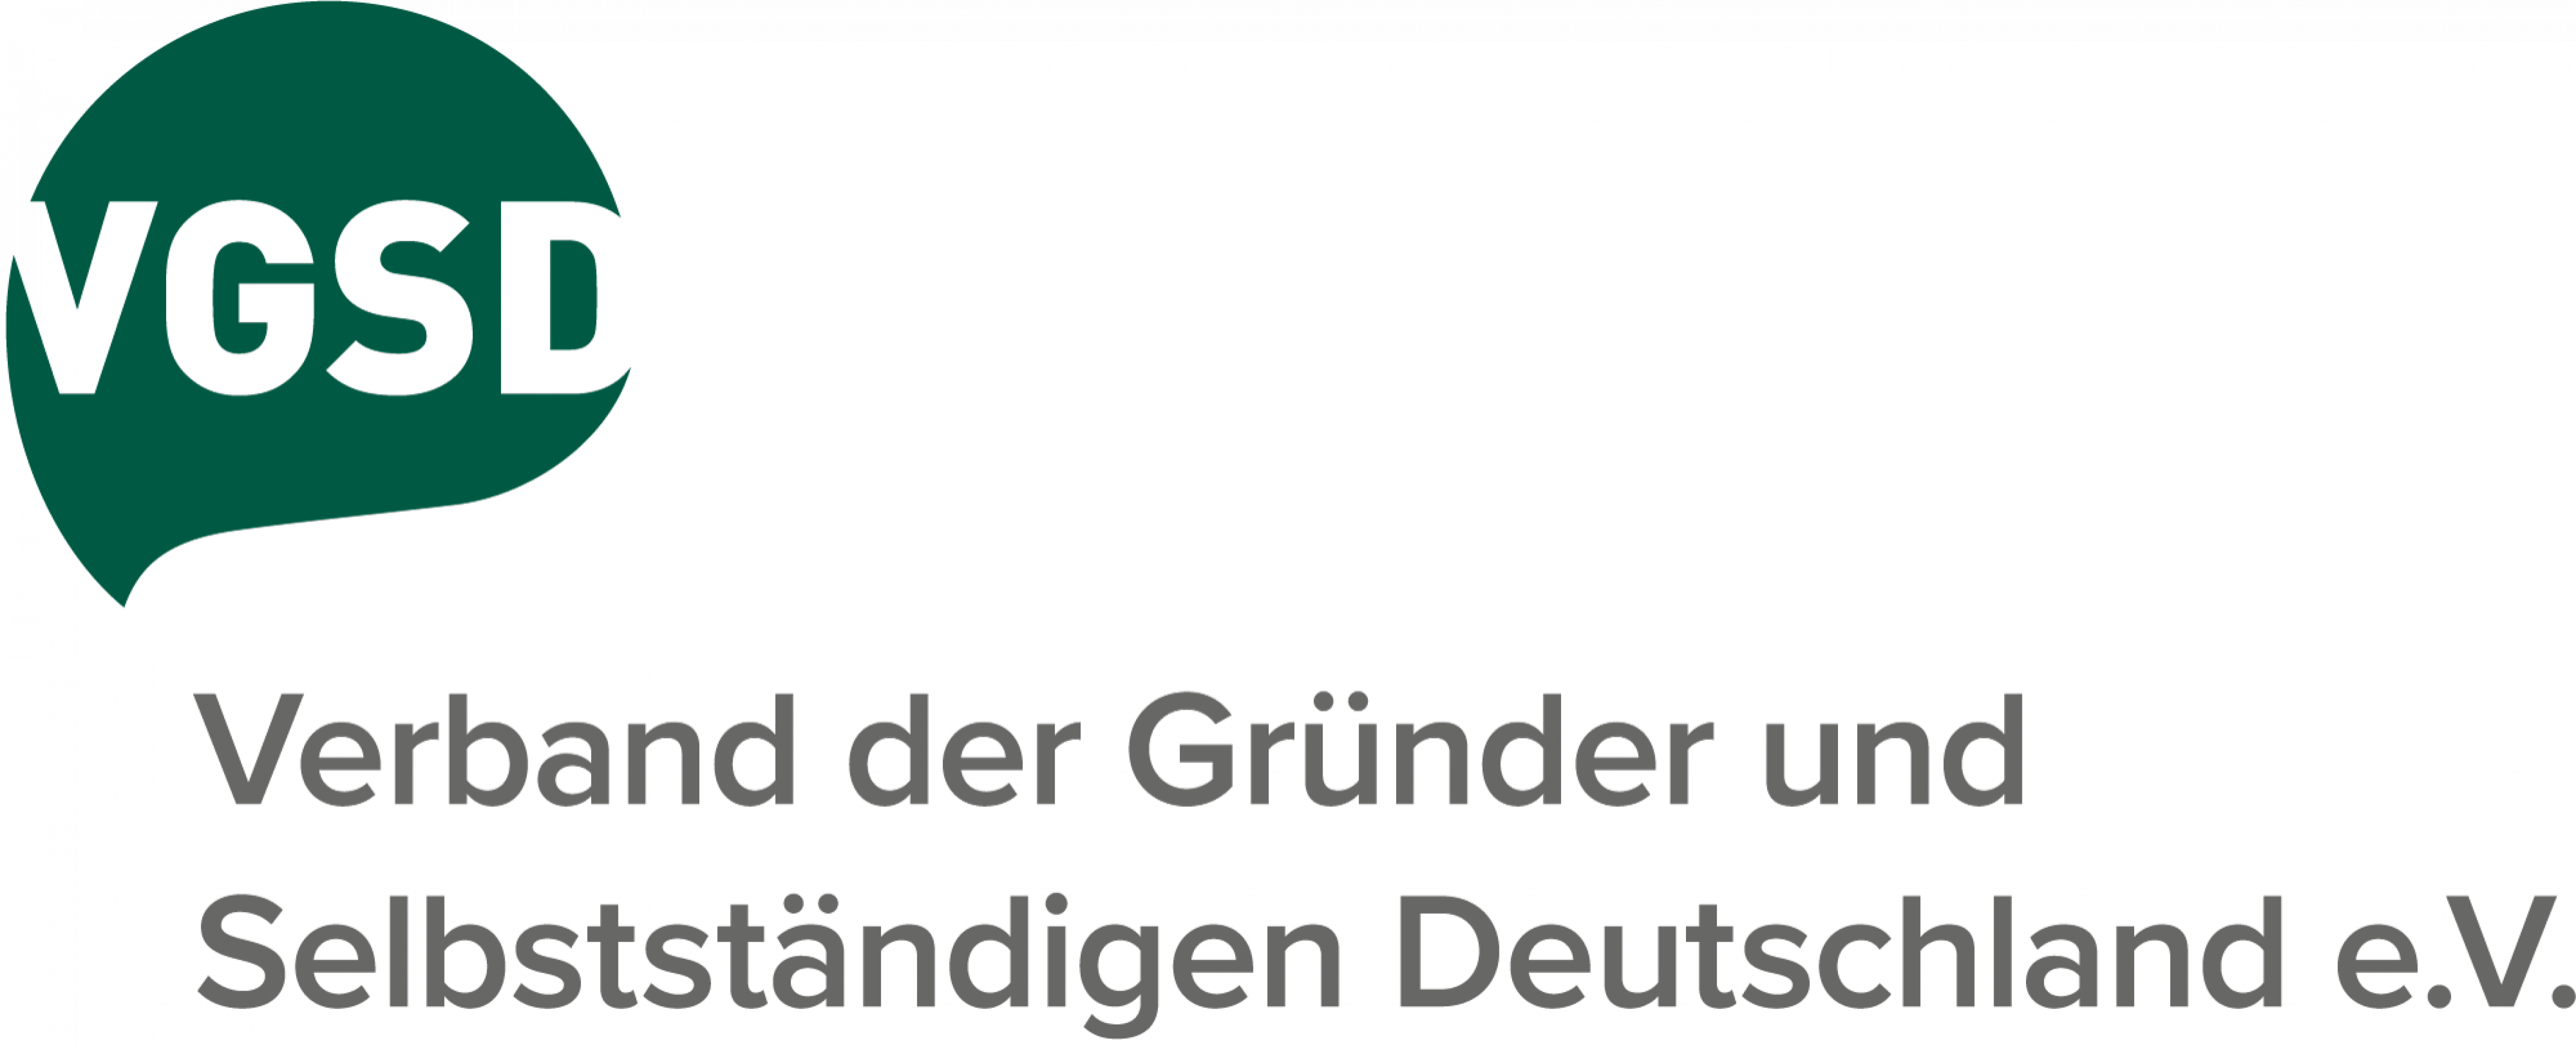 VGSD-Logo-mit-Schrift-transparent-2000x811